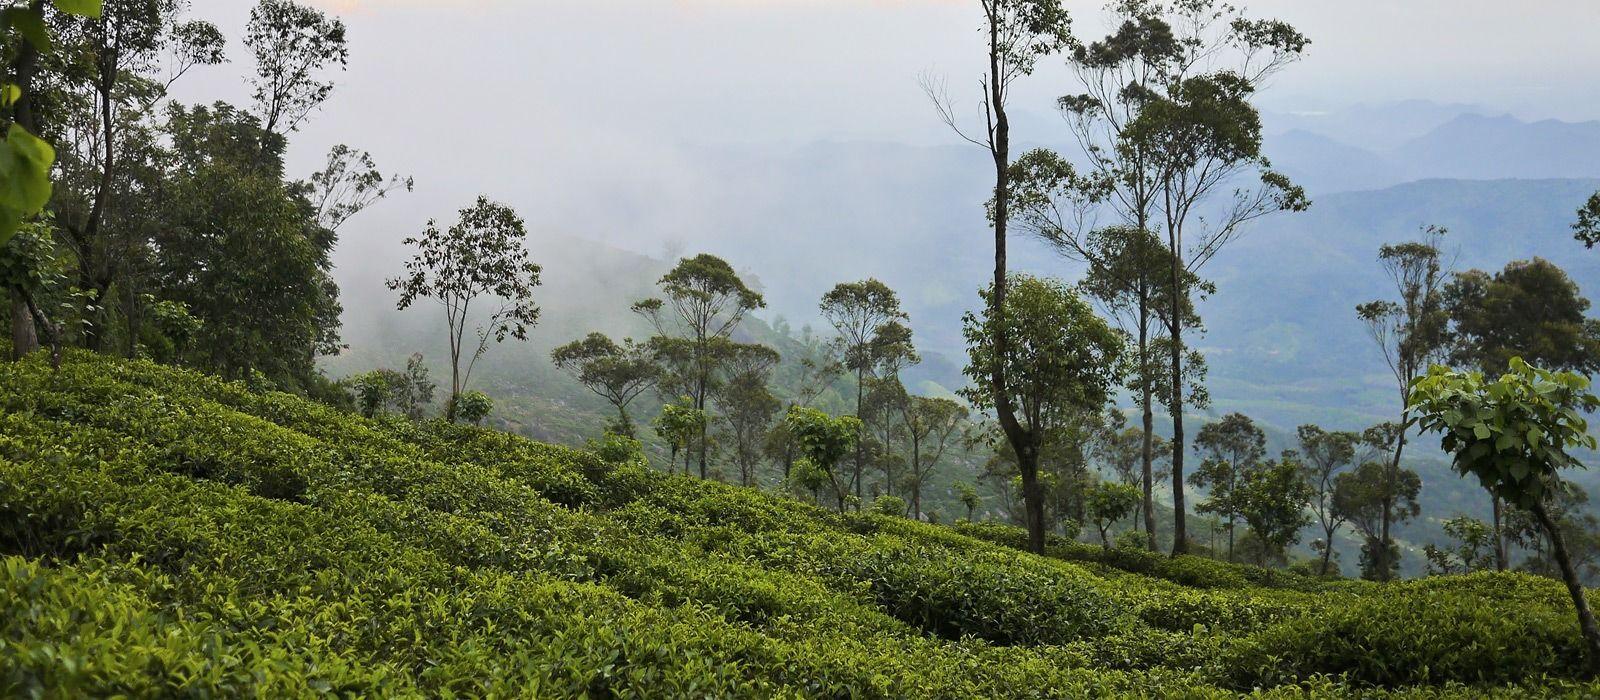 Destination Adam's Peak Sri Lanka